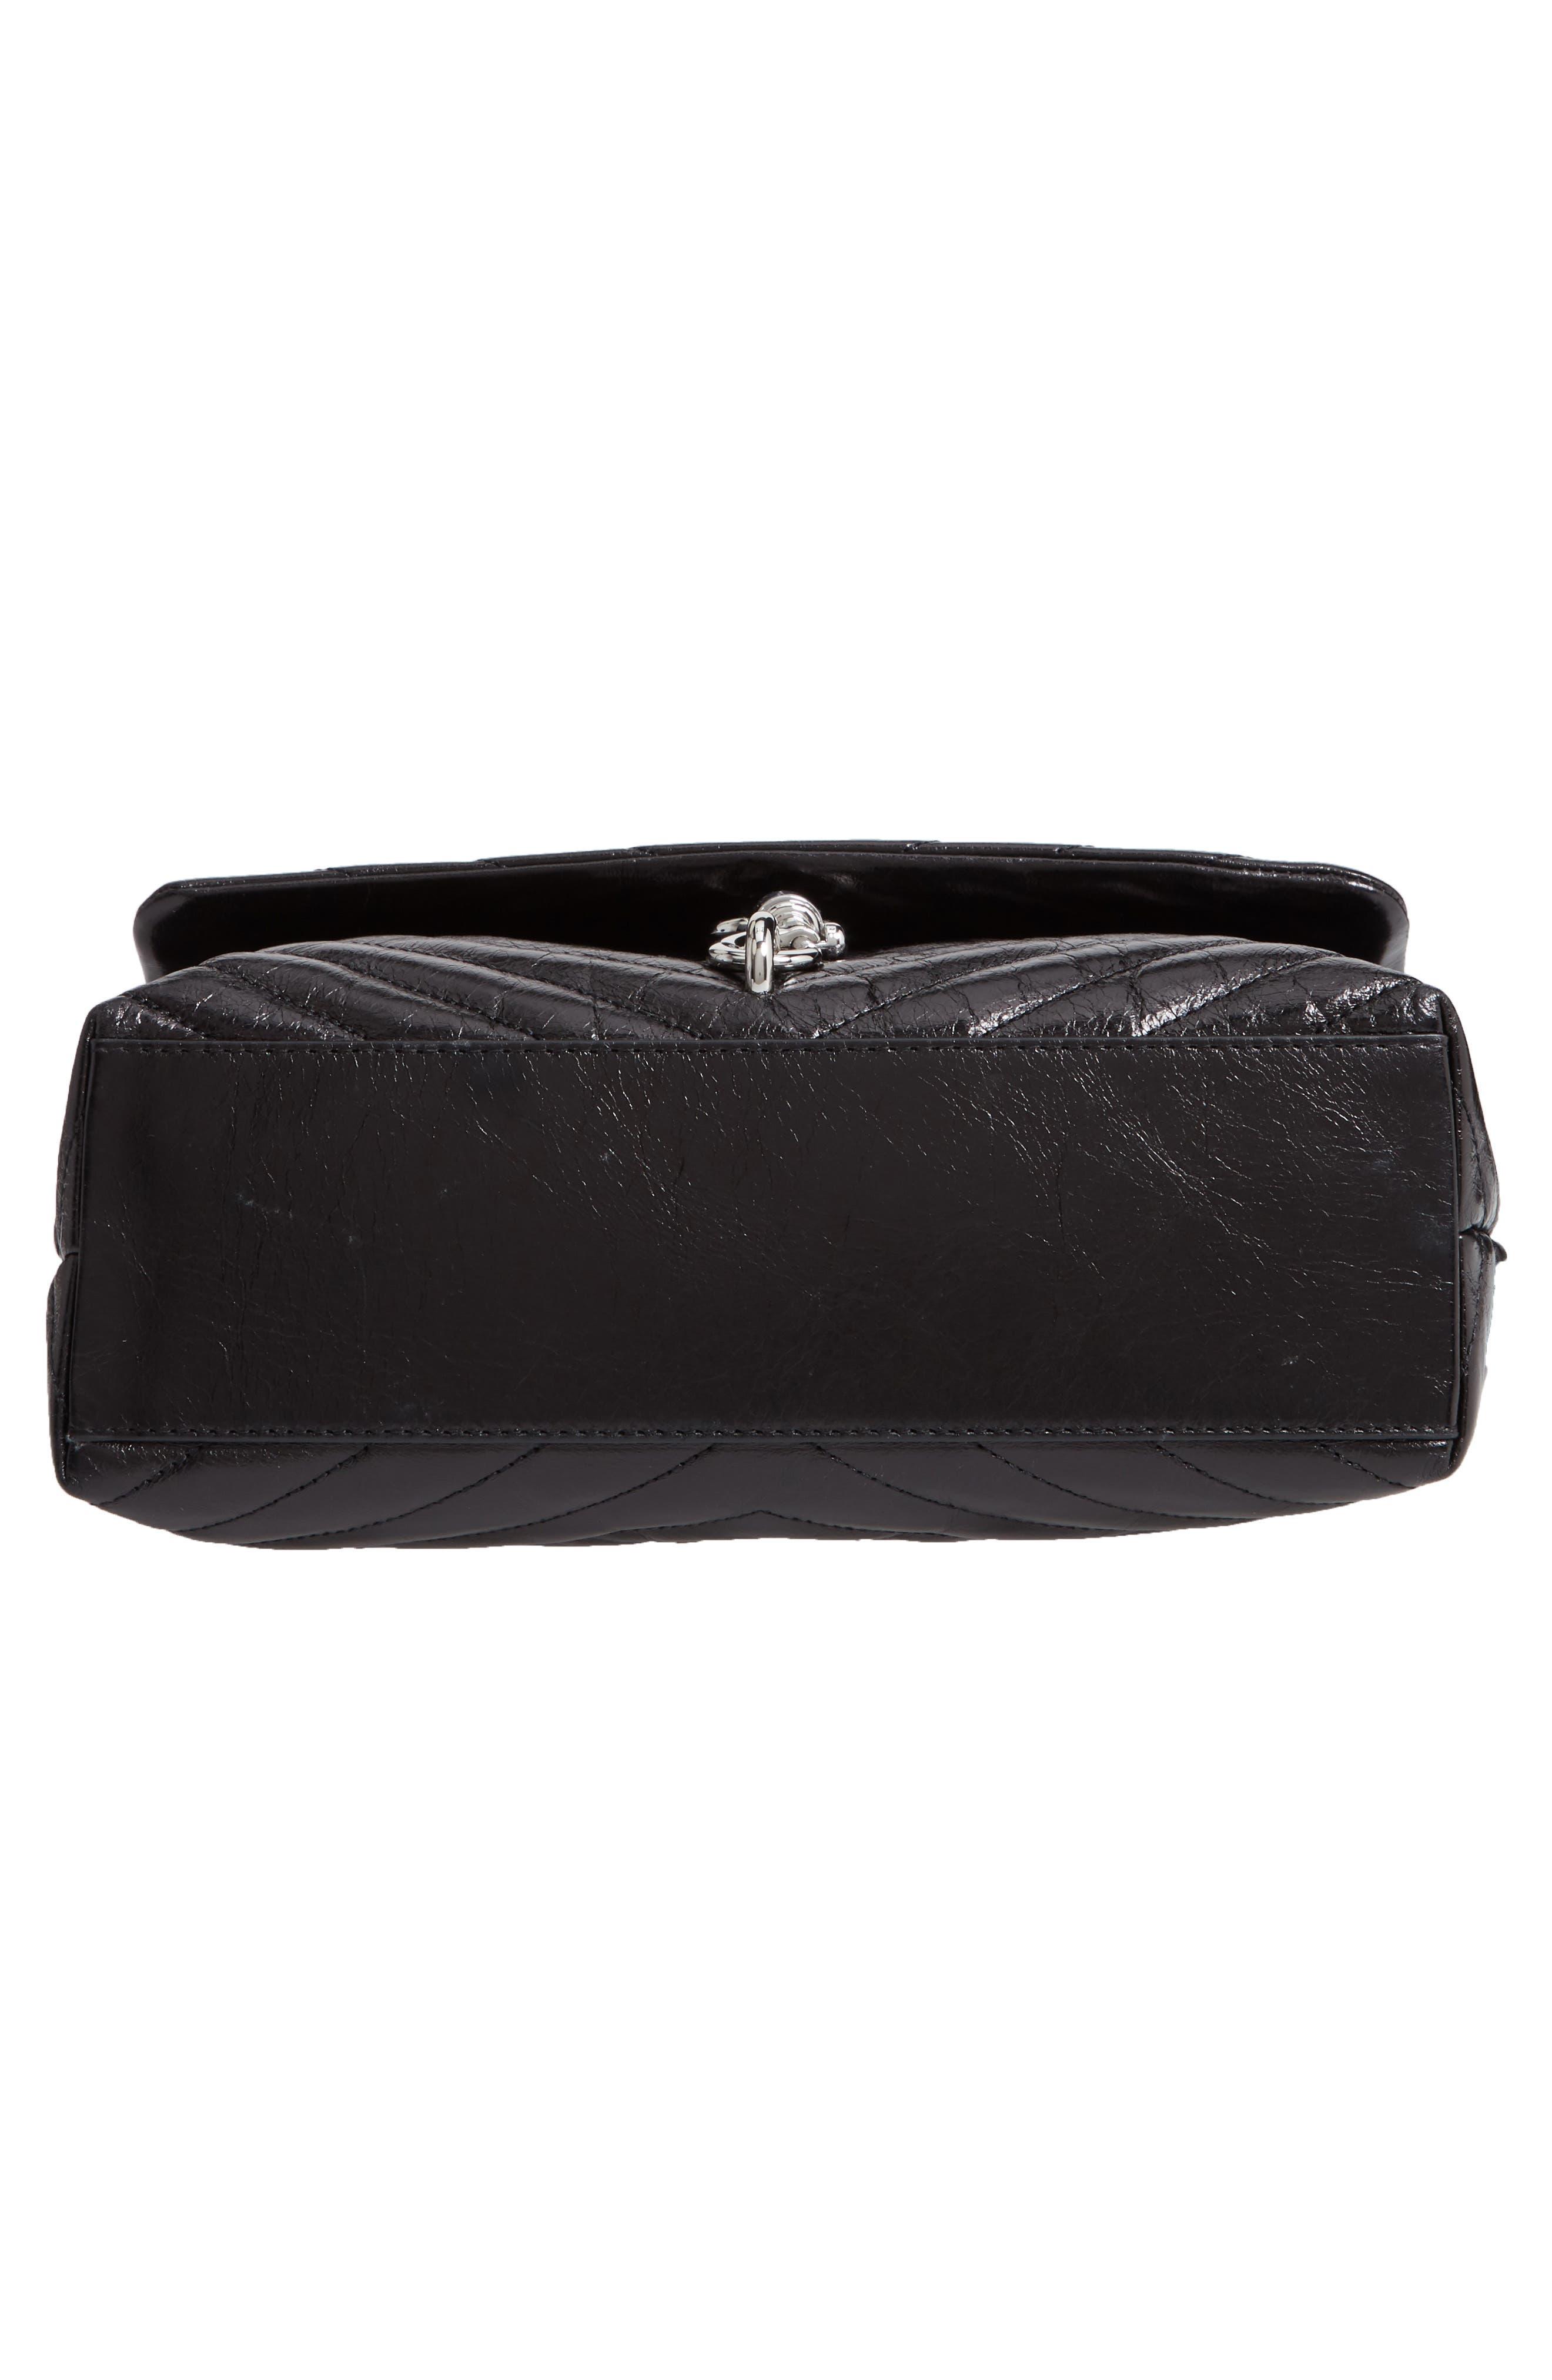 Edie Flap Front Leather Shoulder Bag,                             Alternate thumbnail 6, color,                             BLACK